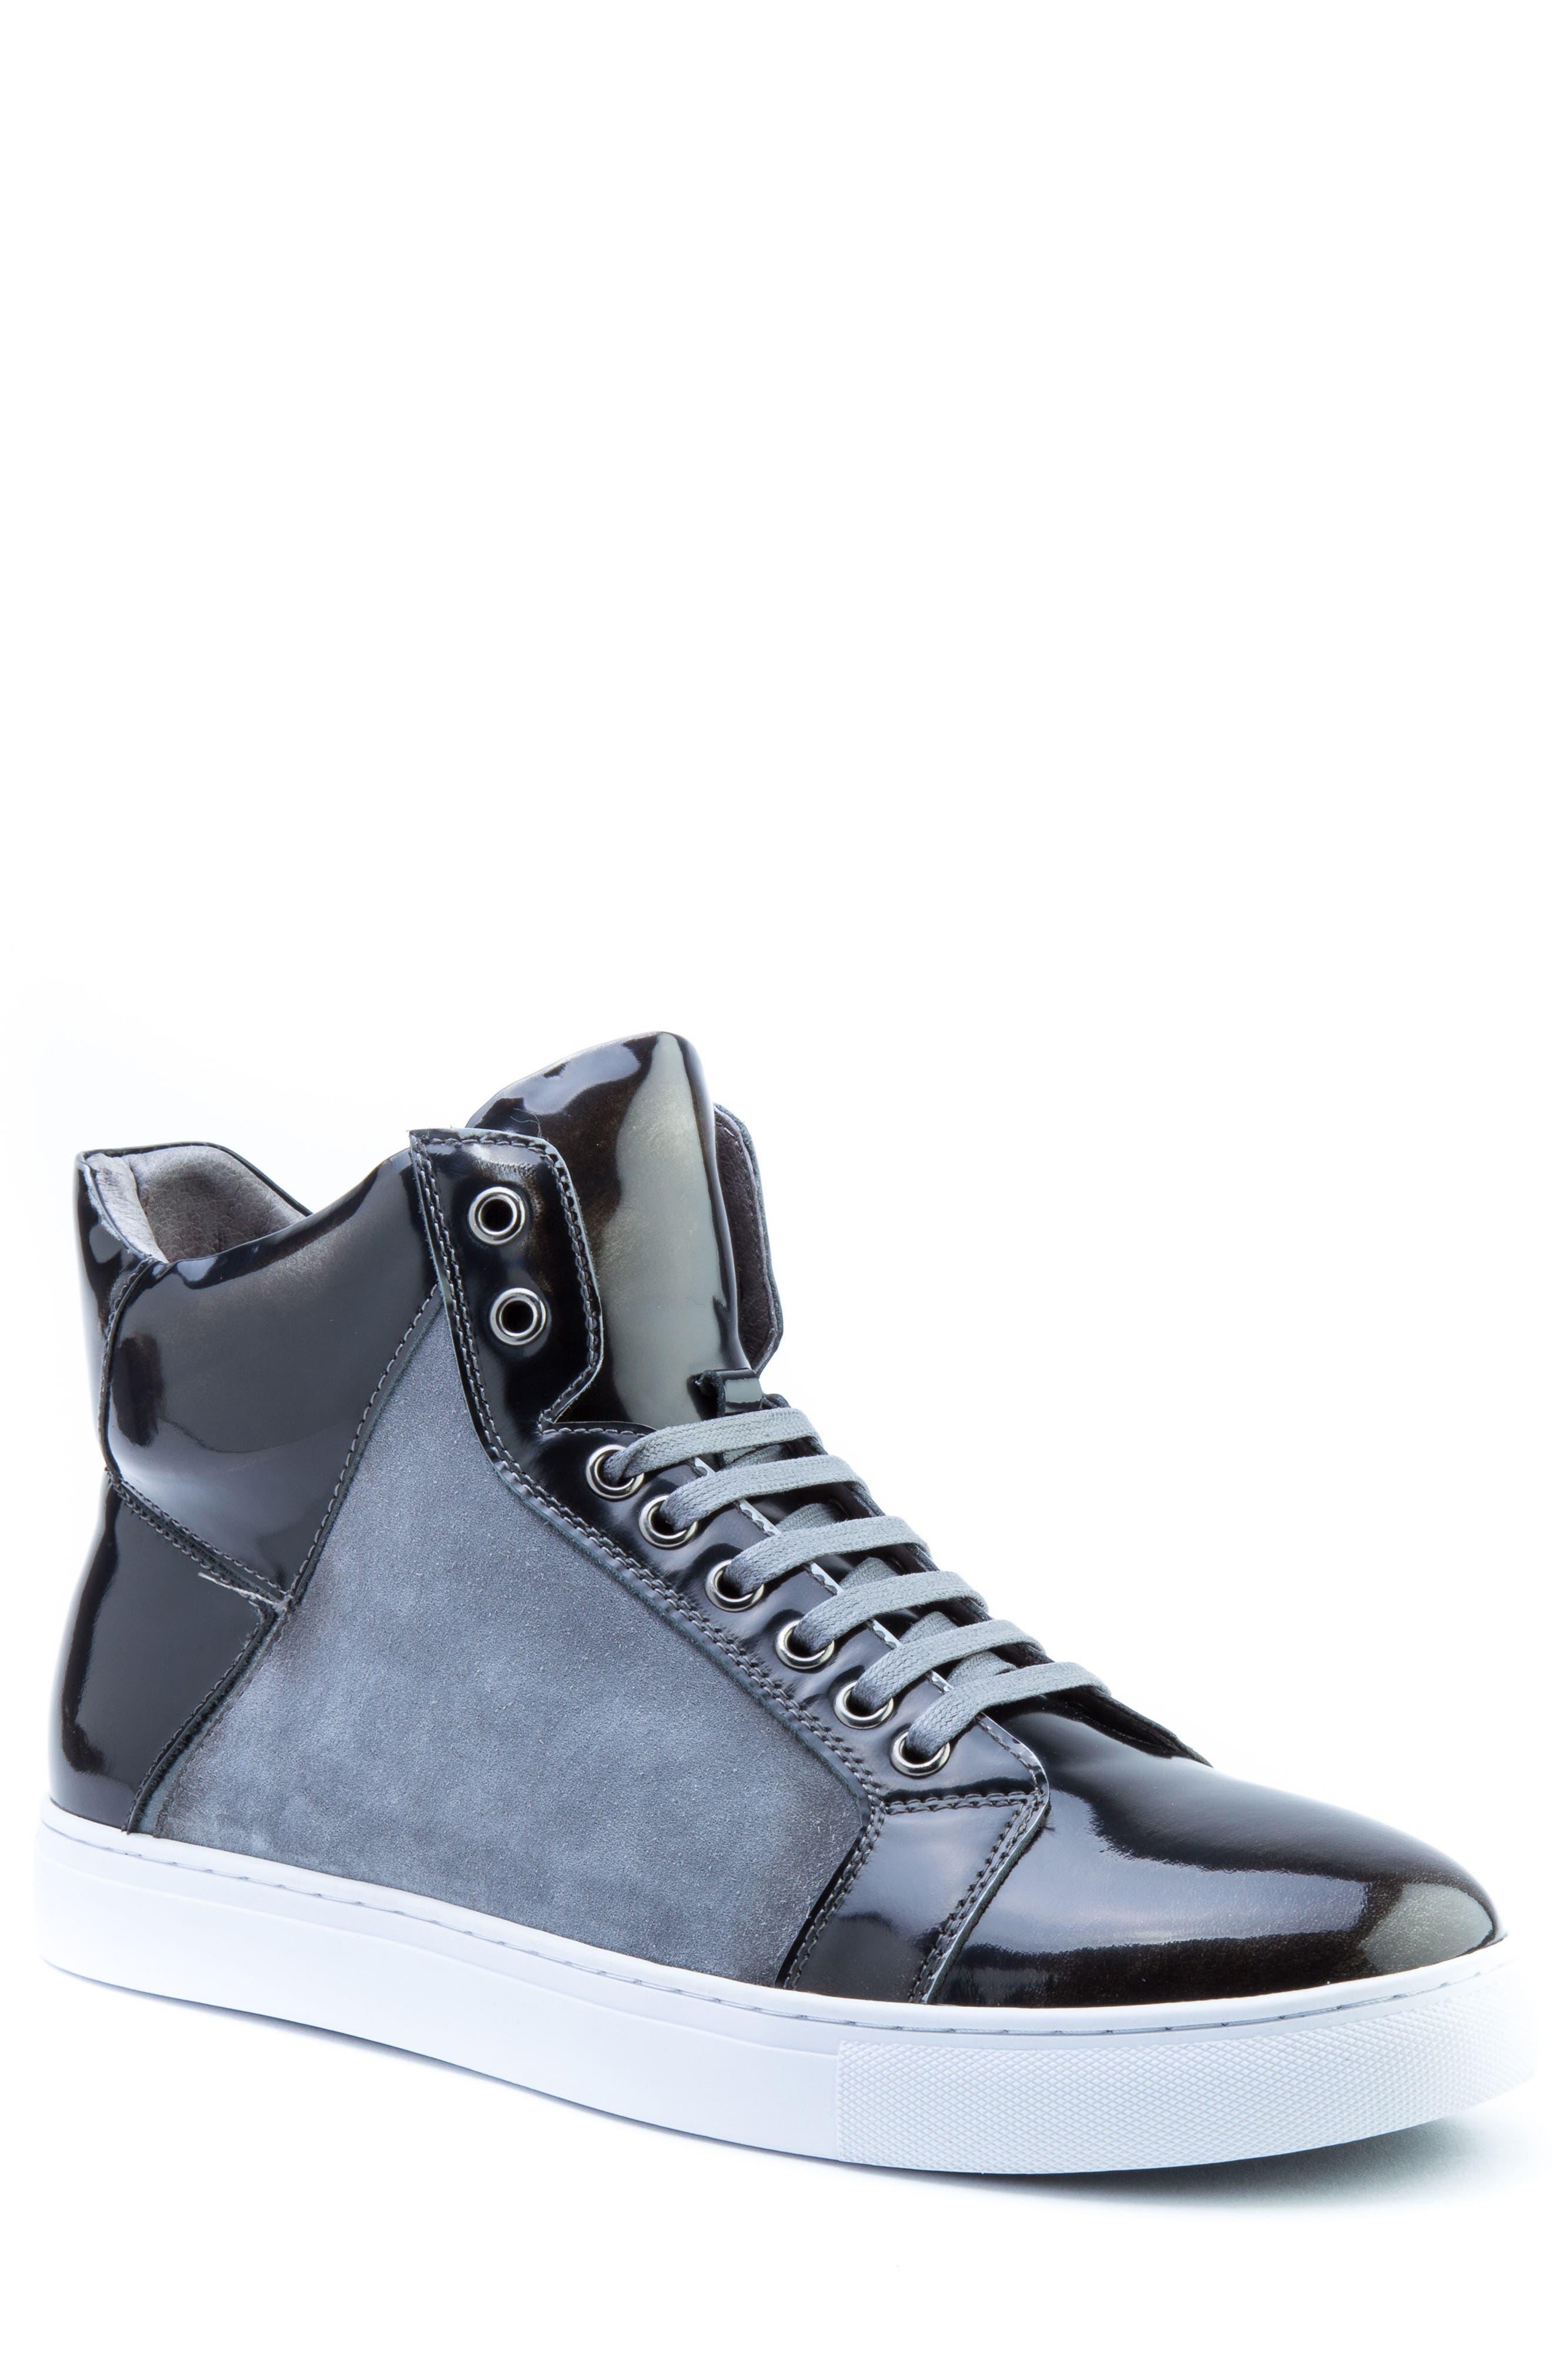 BADGLEY MISCHKA COLLECTION Badgley Mischka Douglas High Top Sneaker, Main, color, 001